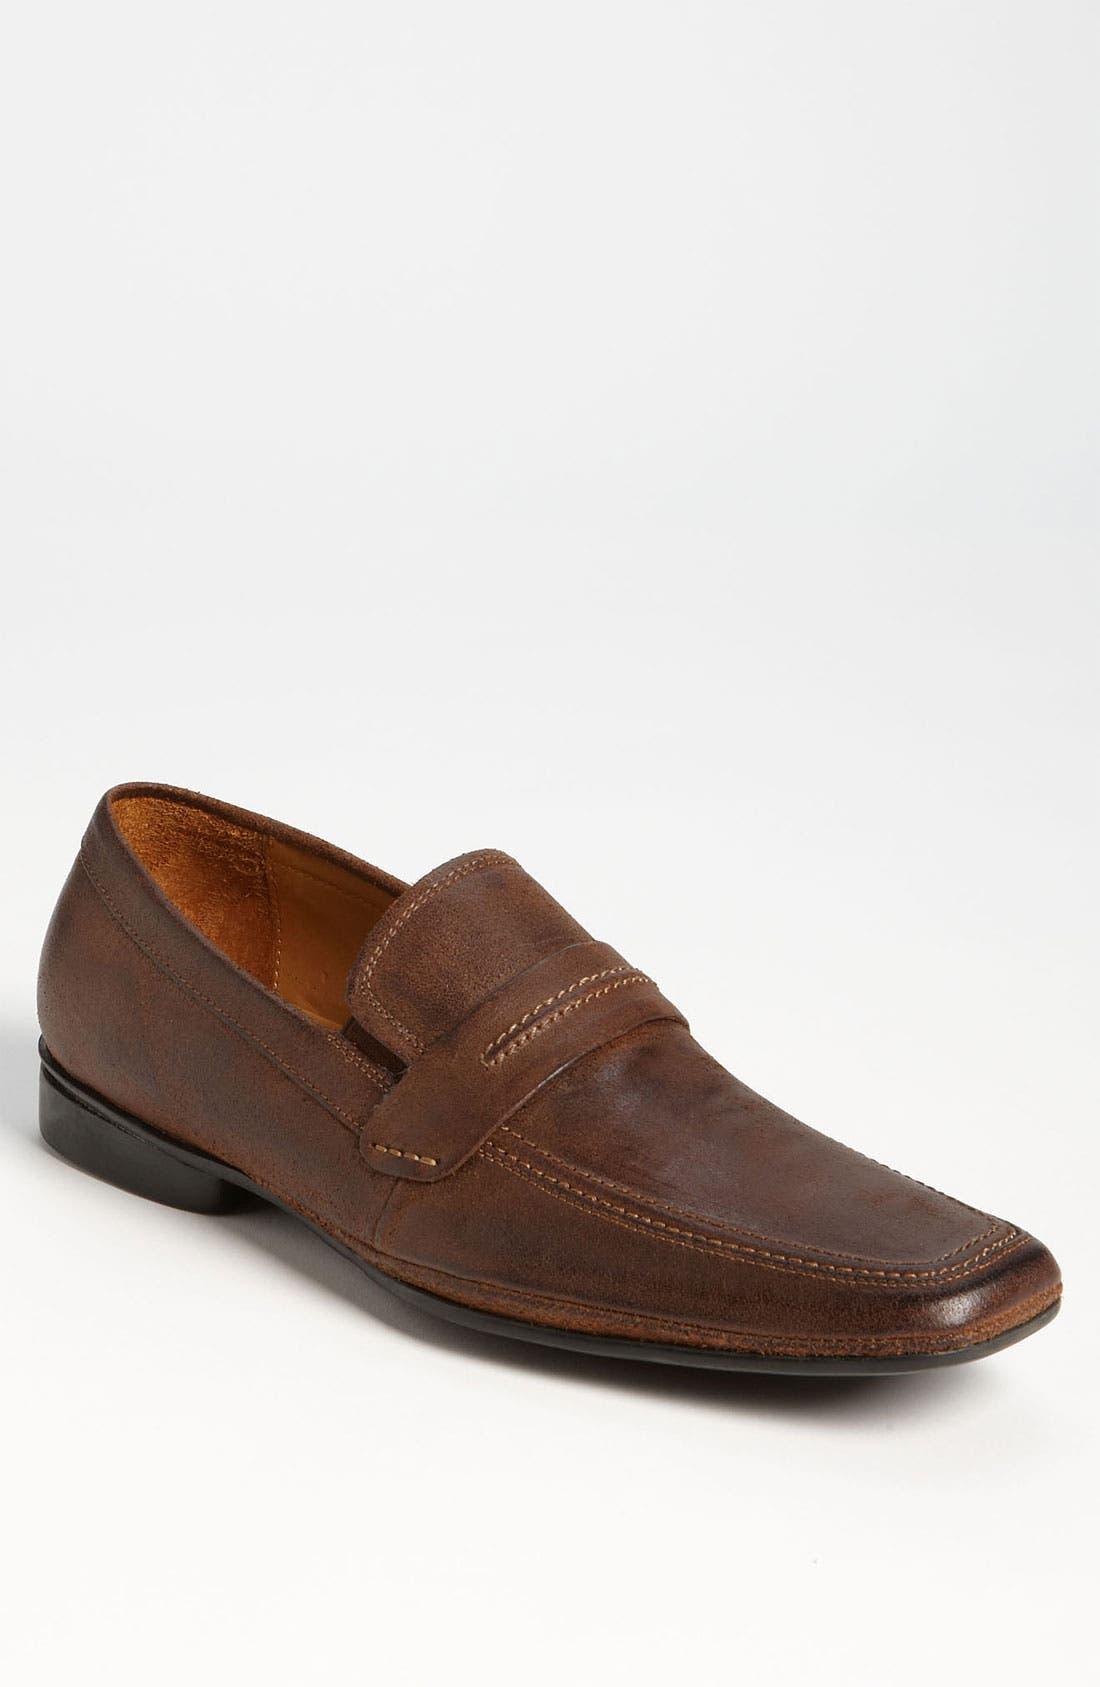 Main Image - ALDO 'Greaves' Loafer